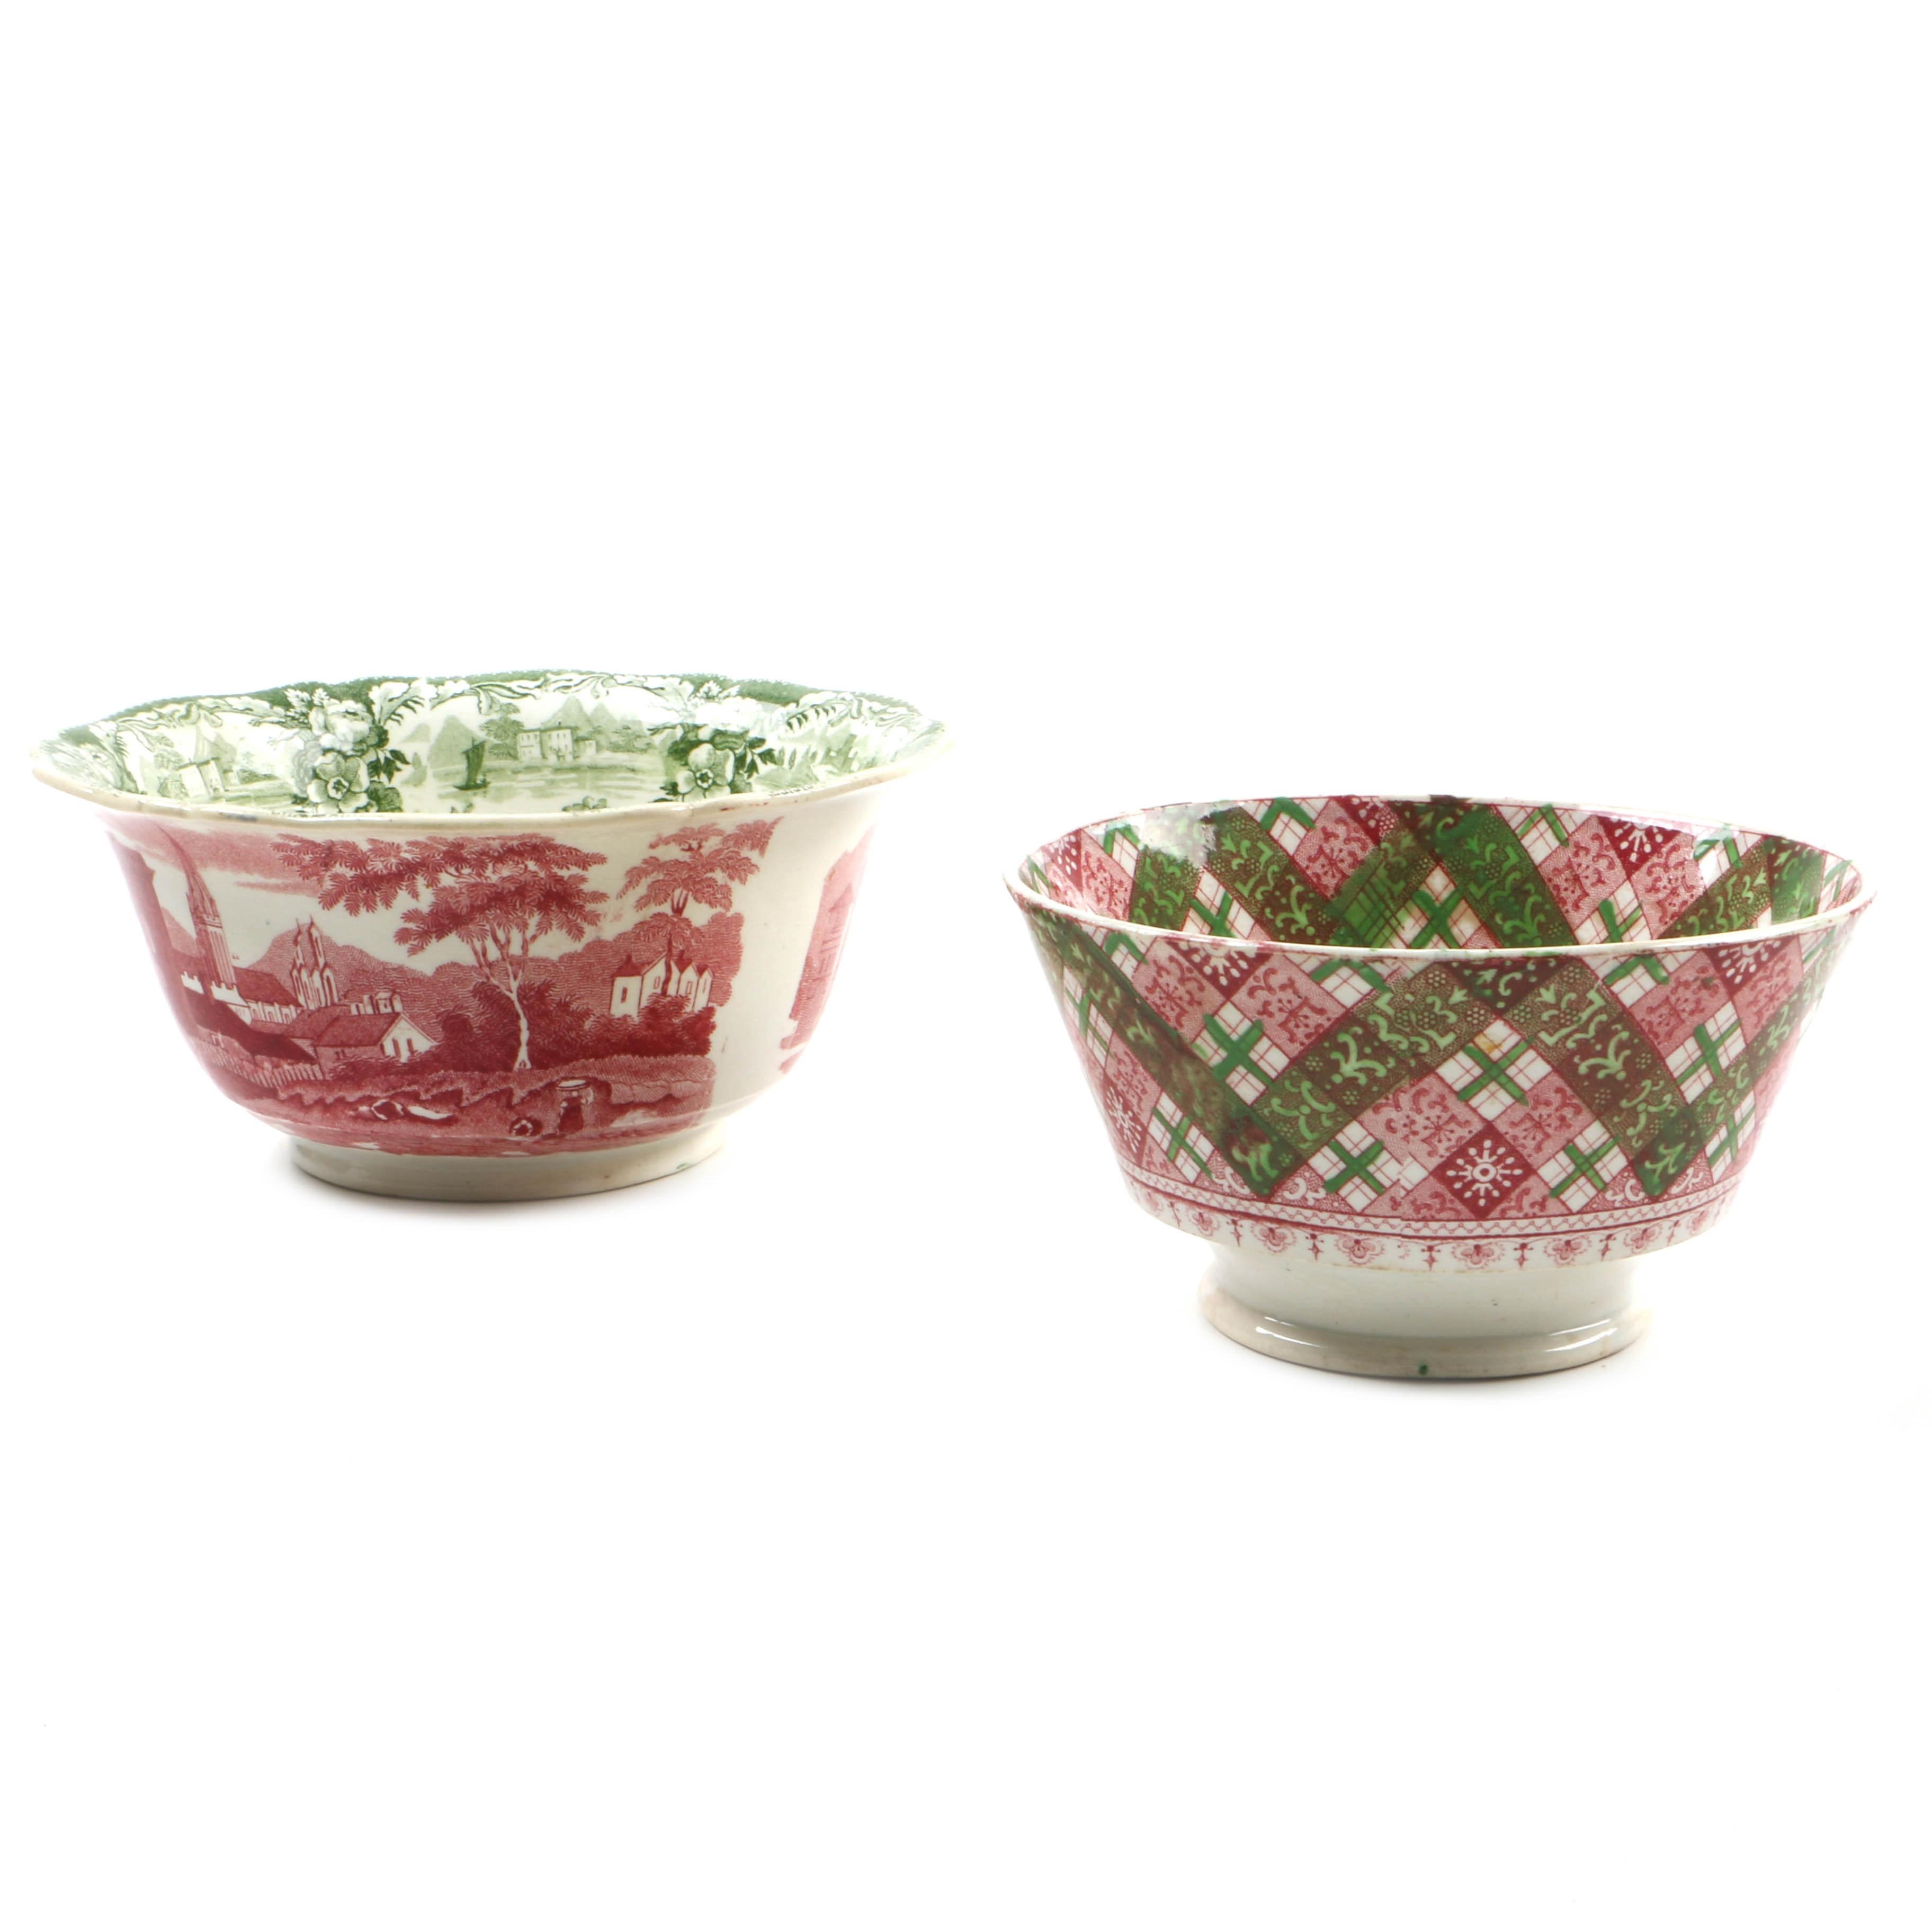 Antique Staffordshire Transferware Bowls